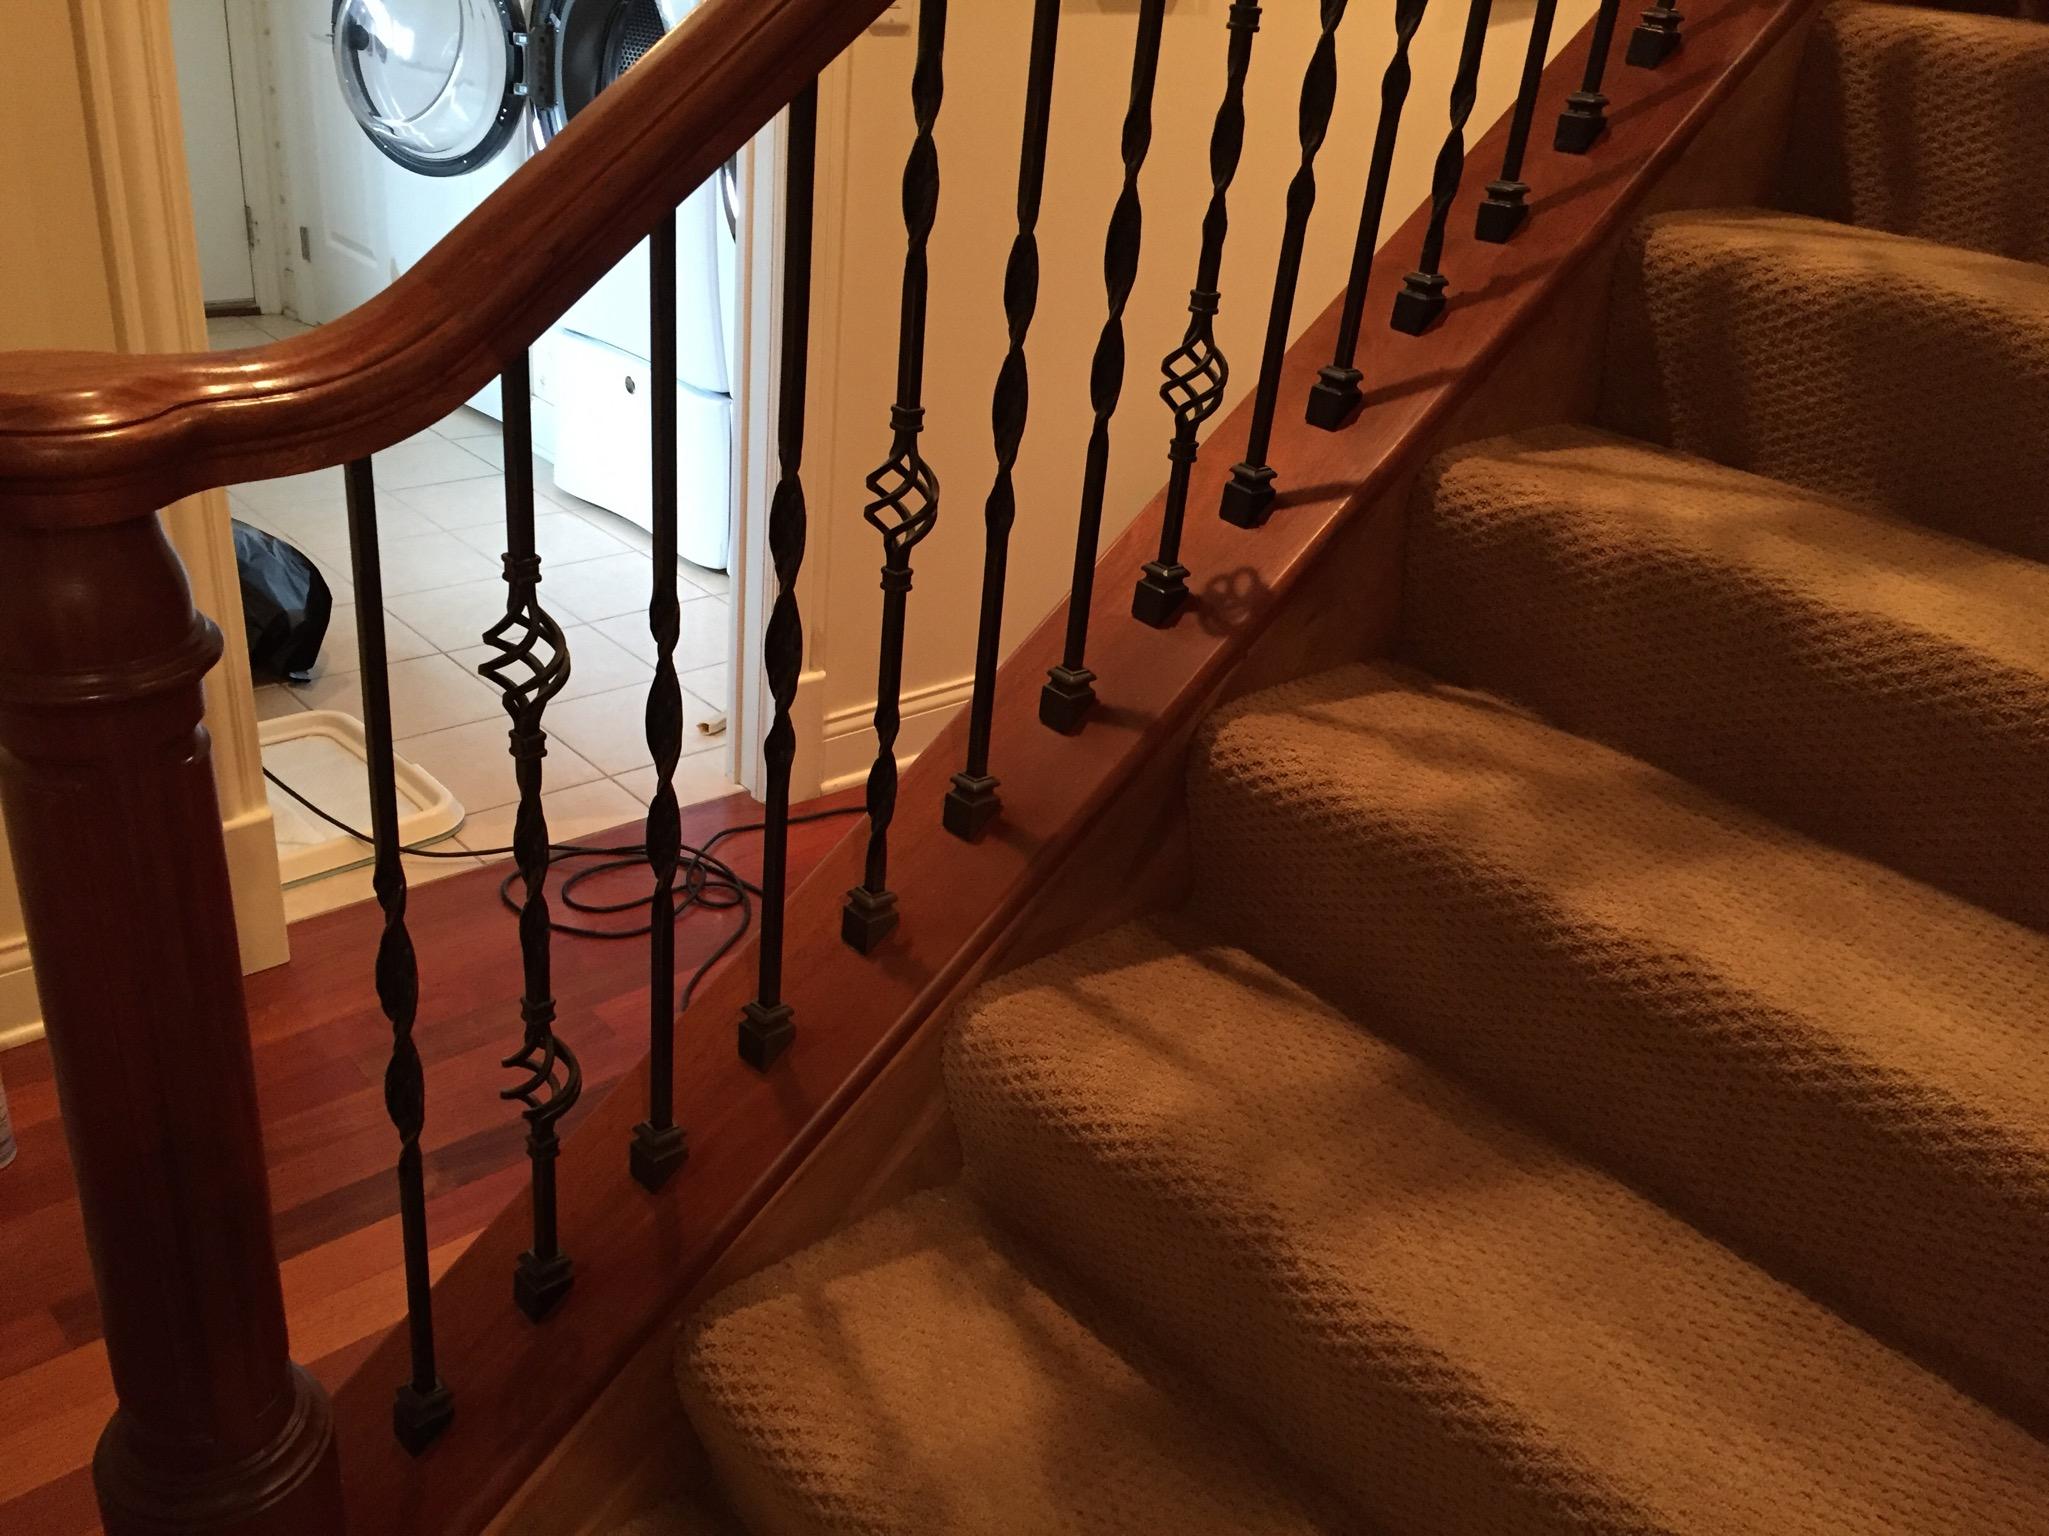 Pet damage at stair railing after.JPG